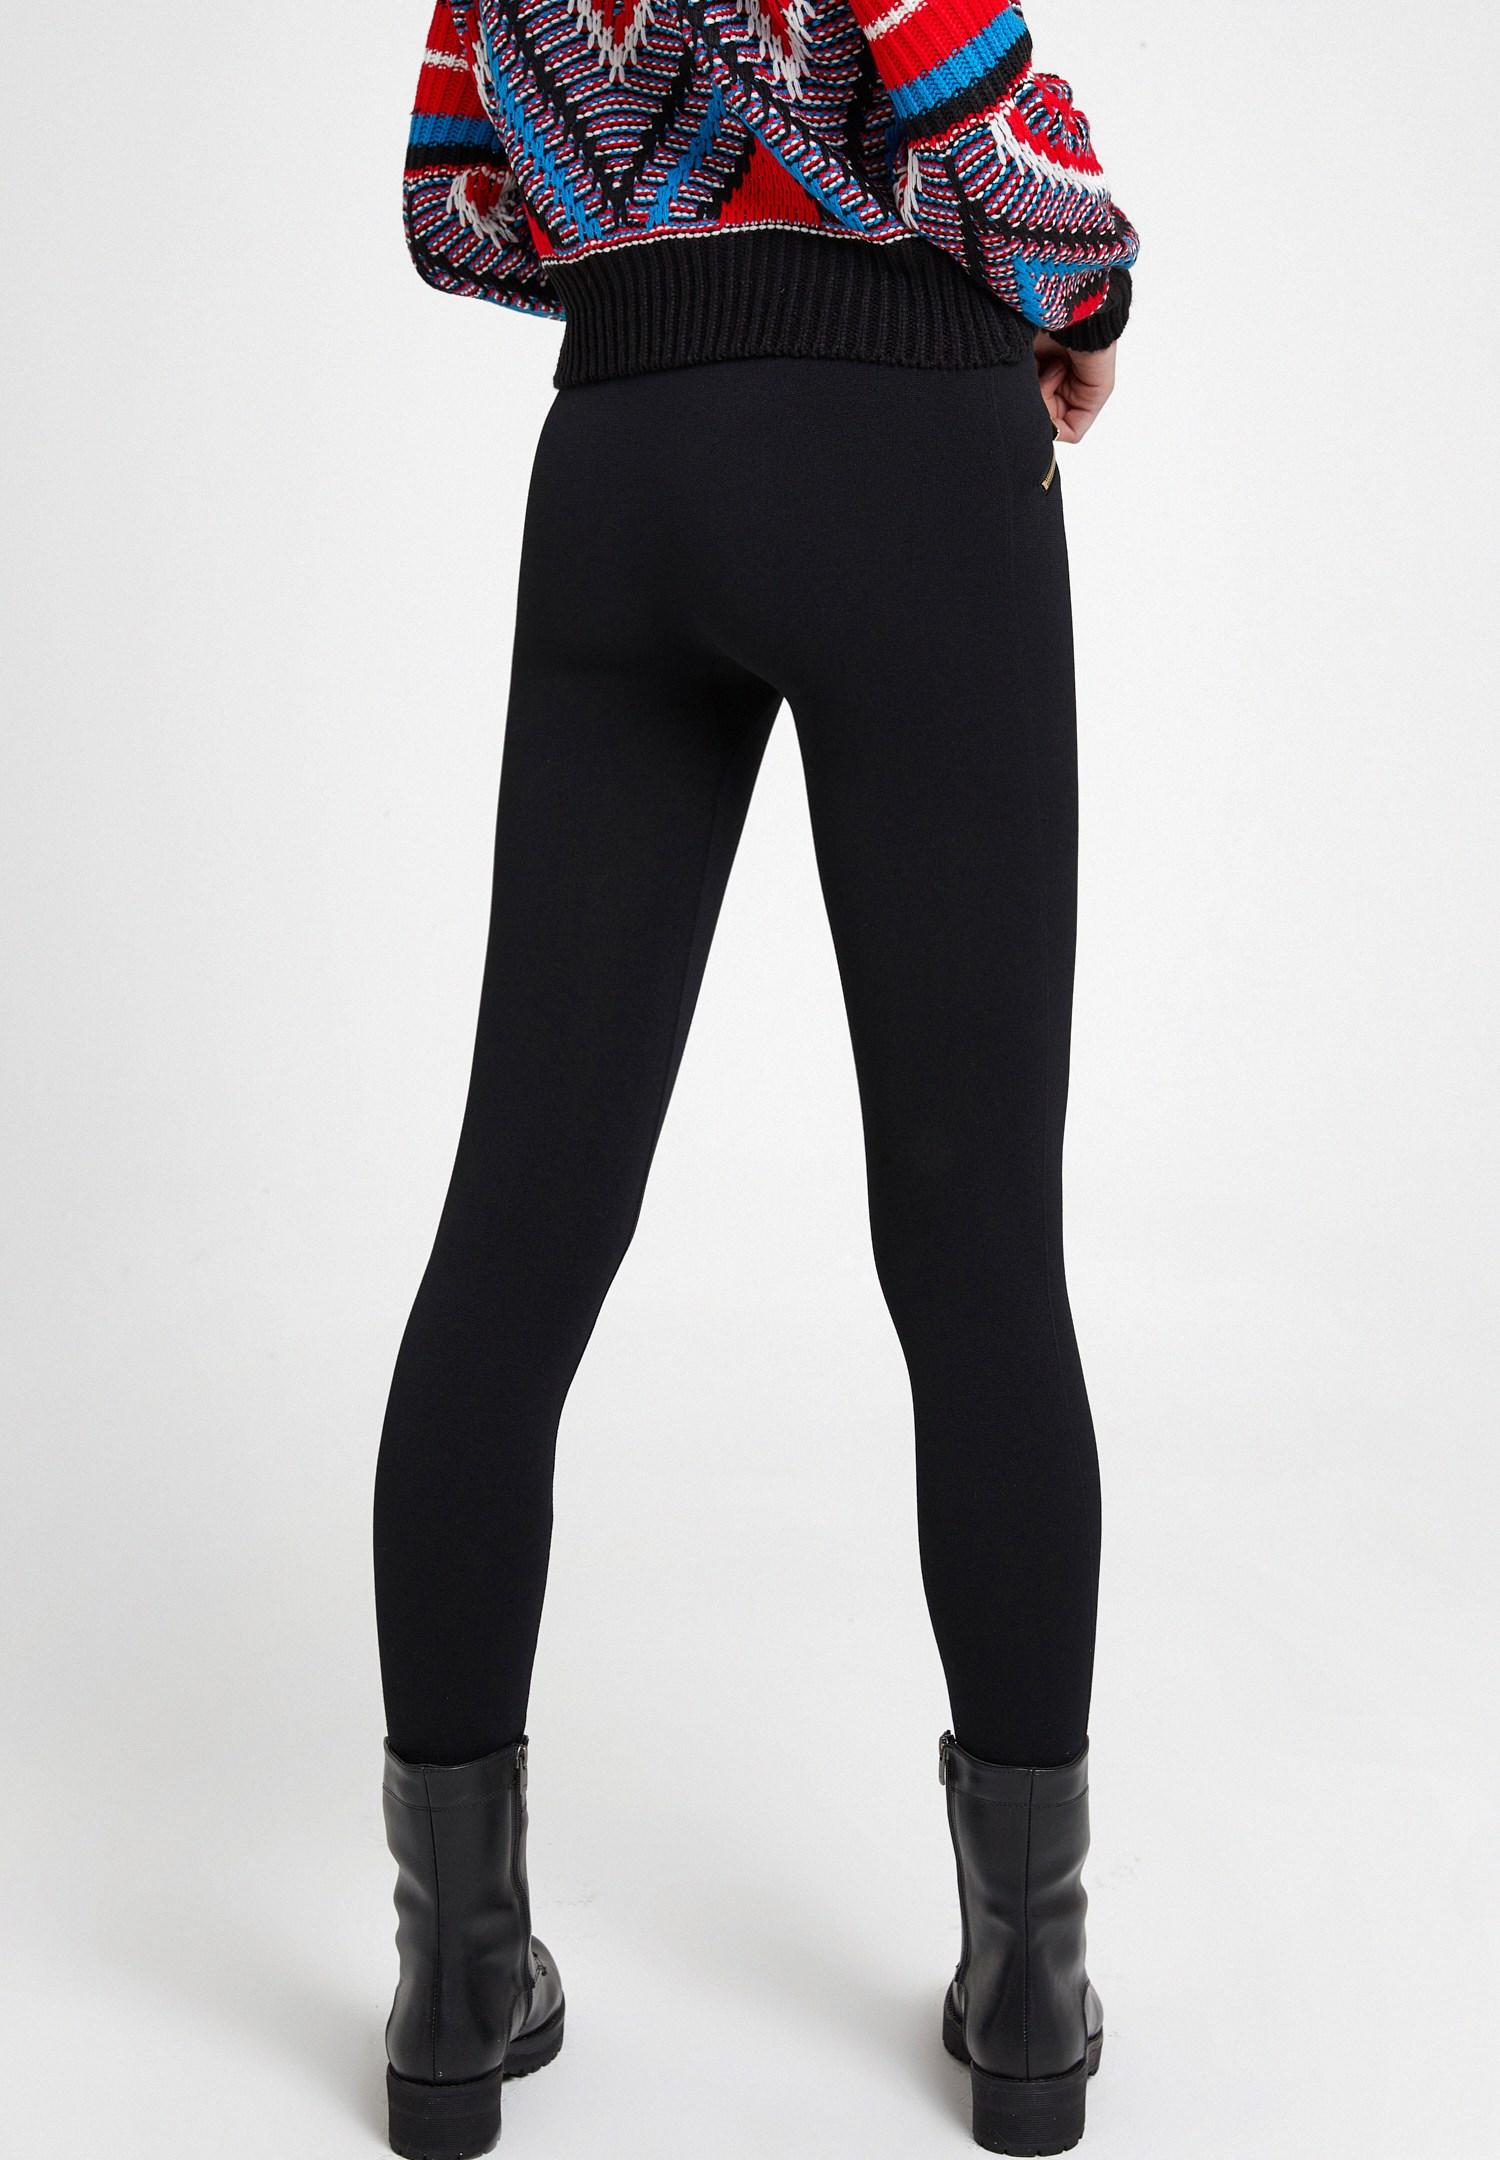 Women Black Leggings with Zips